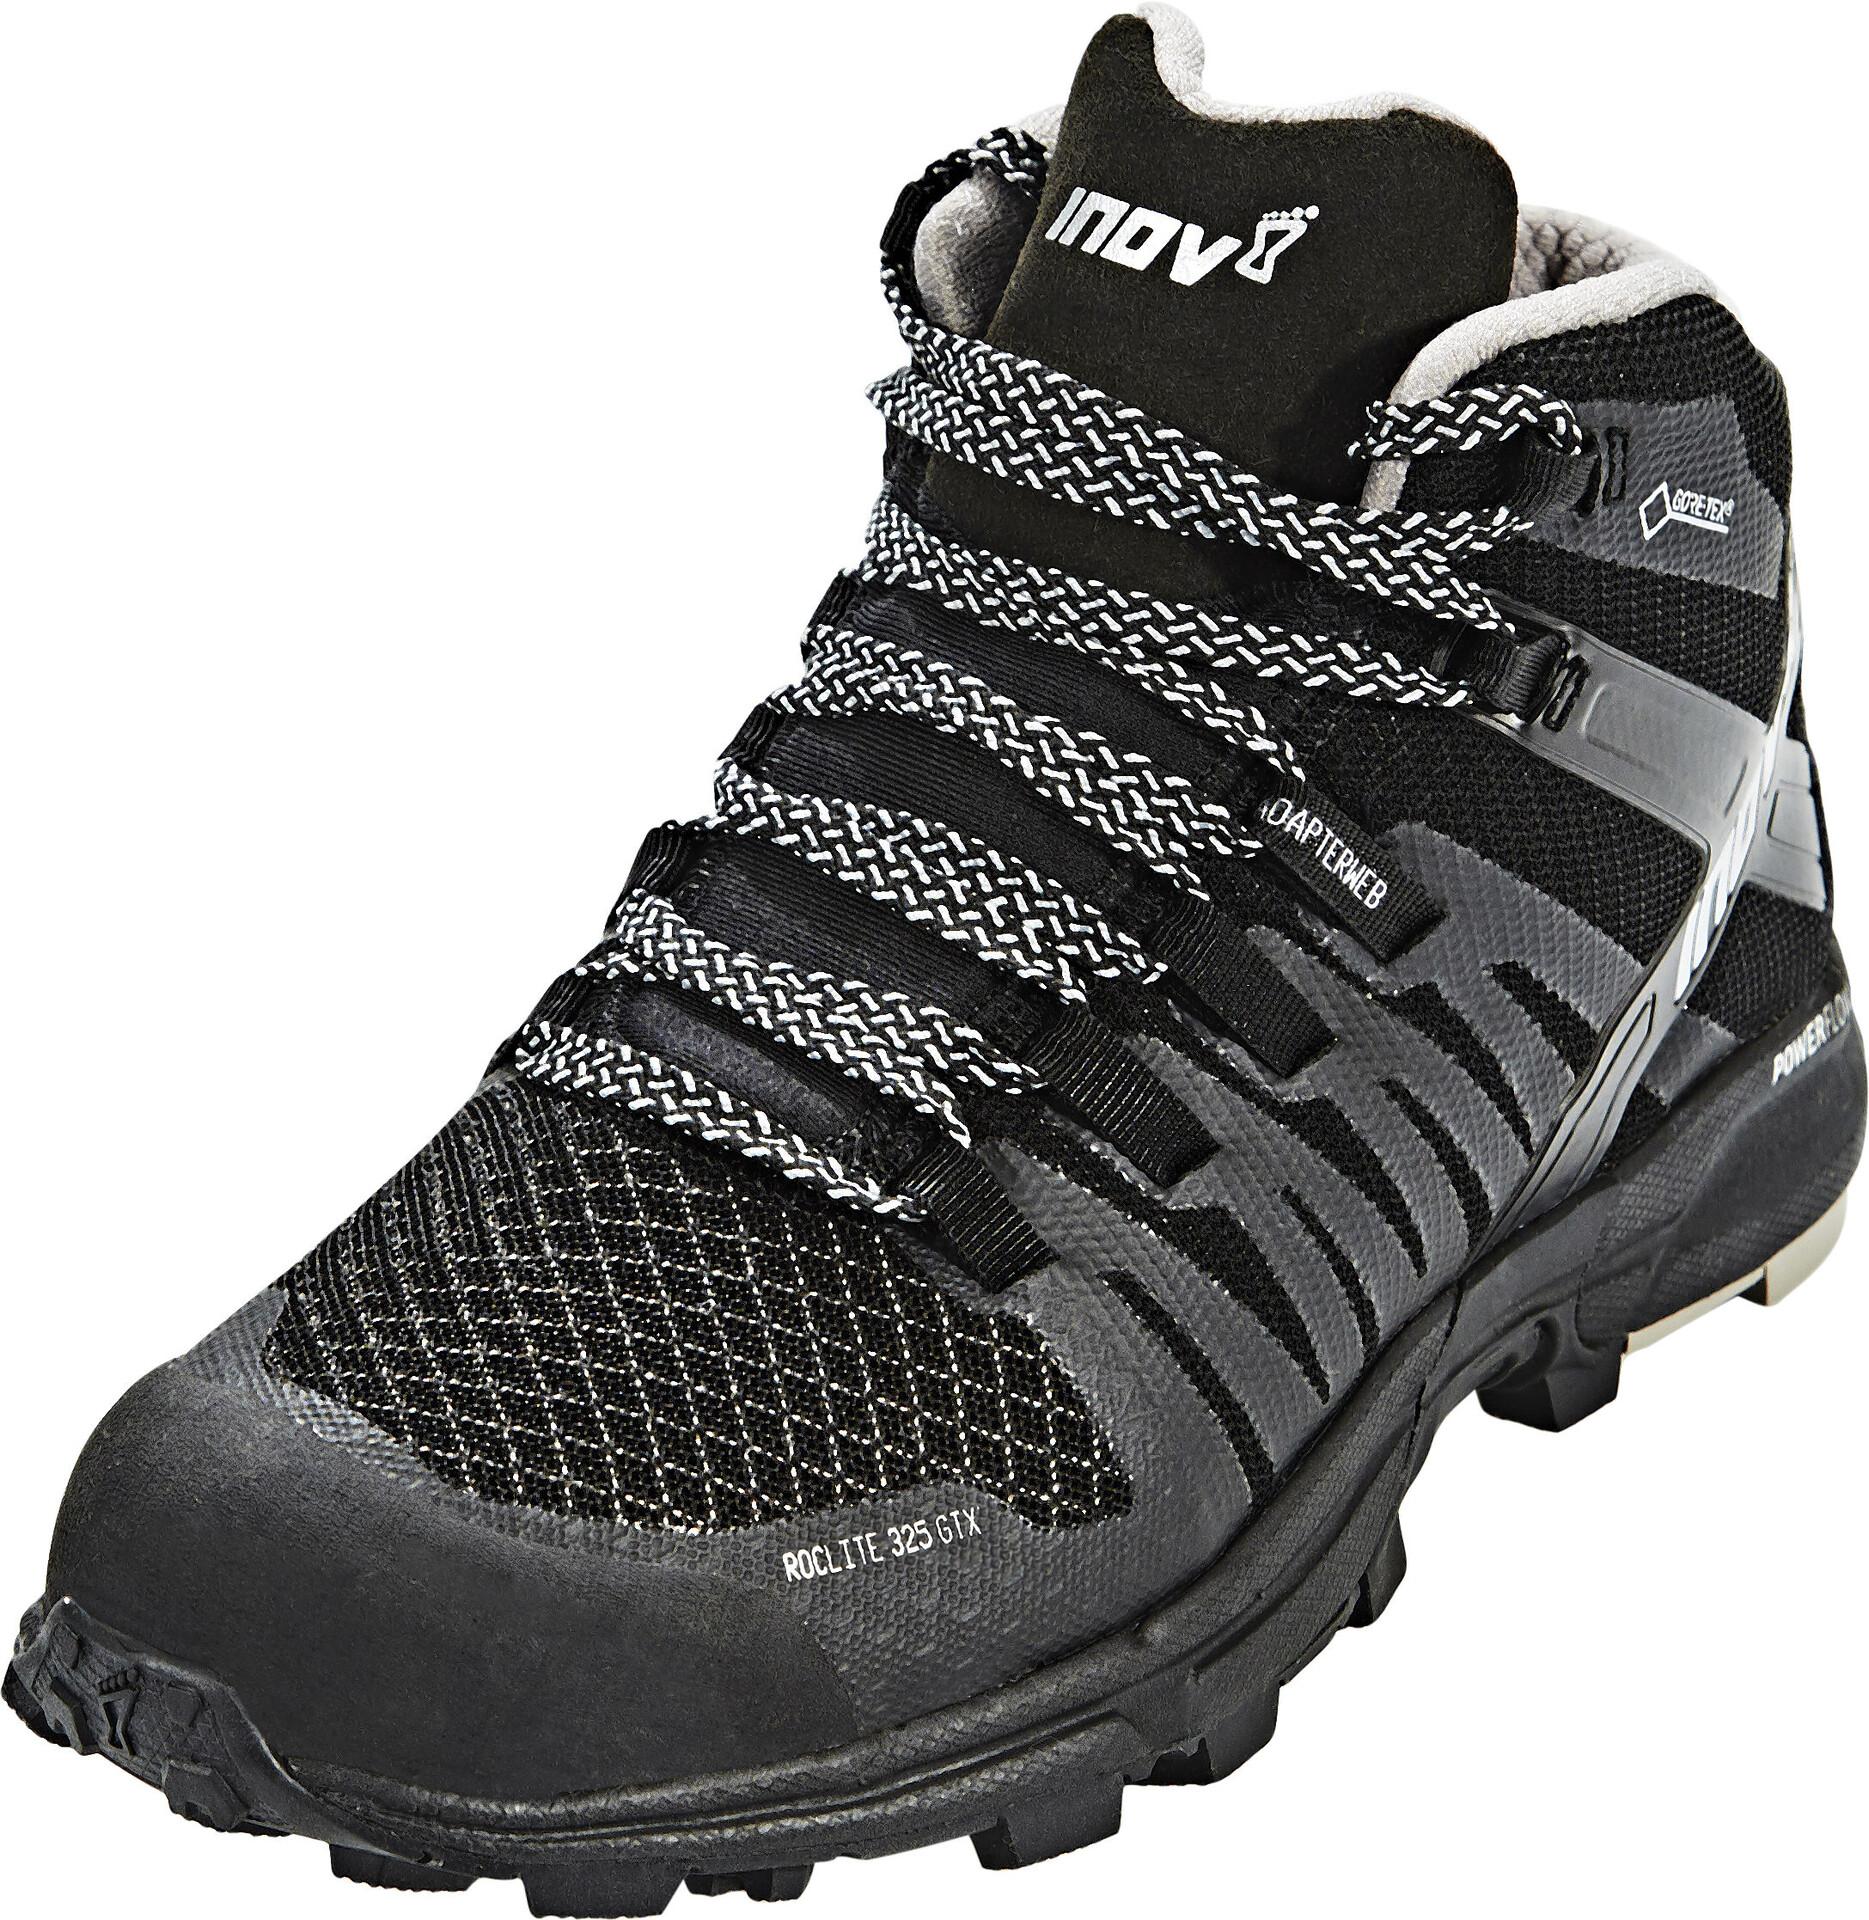 inov-8 Roclite 325 GTX Shoes Women